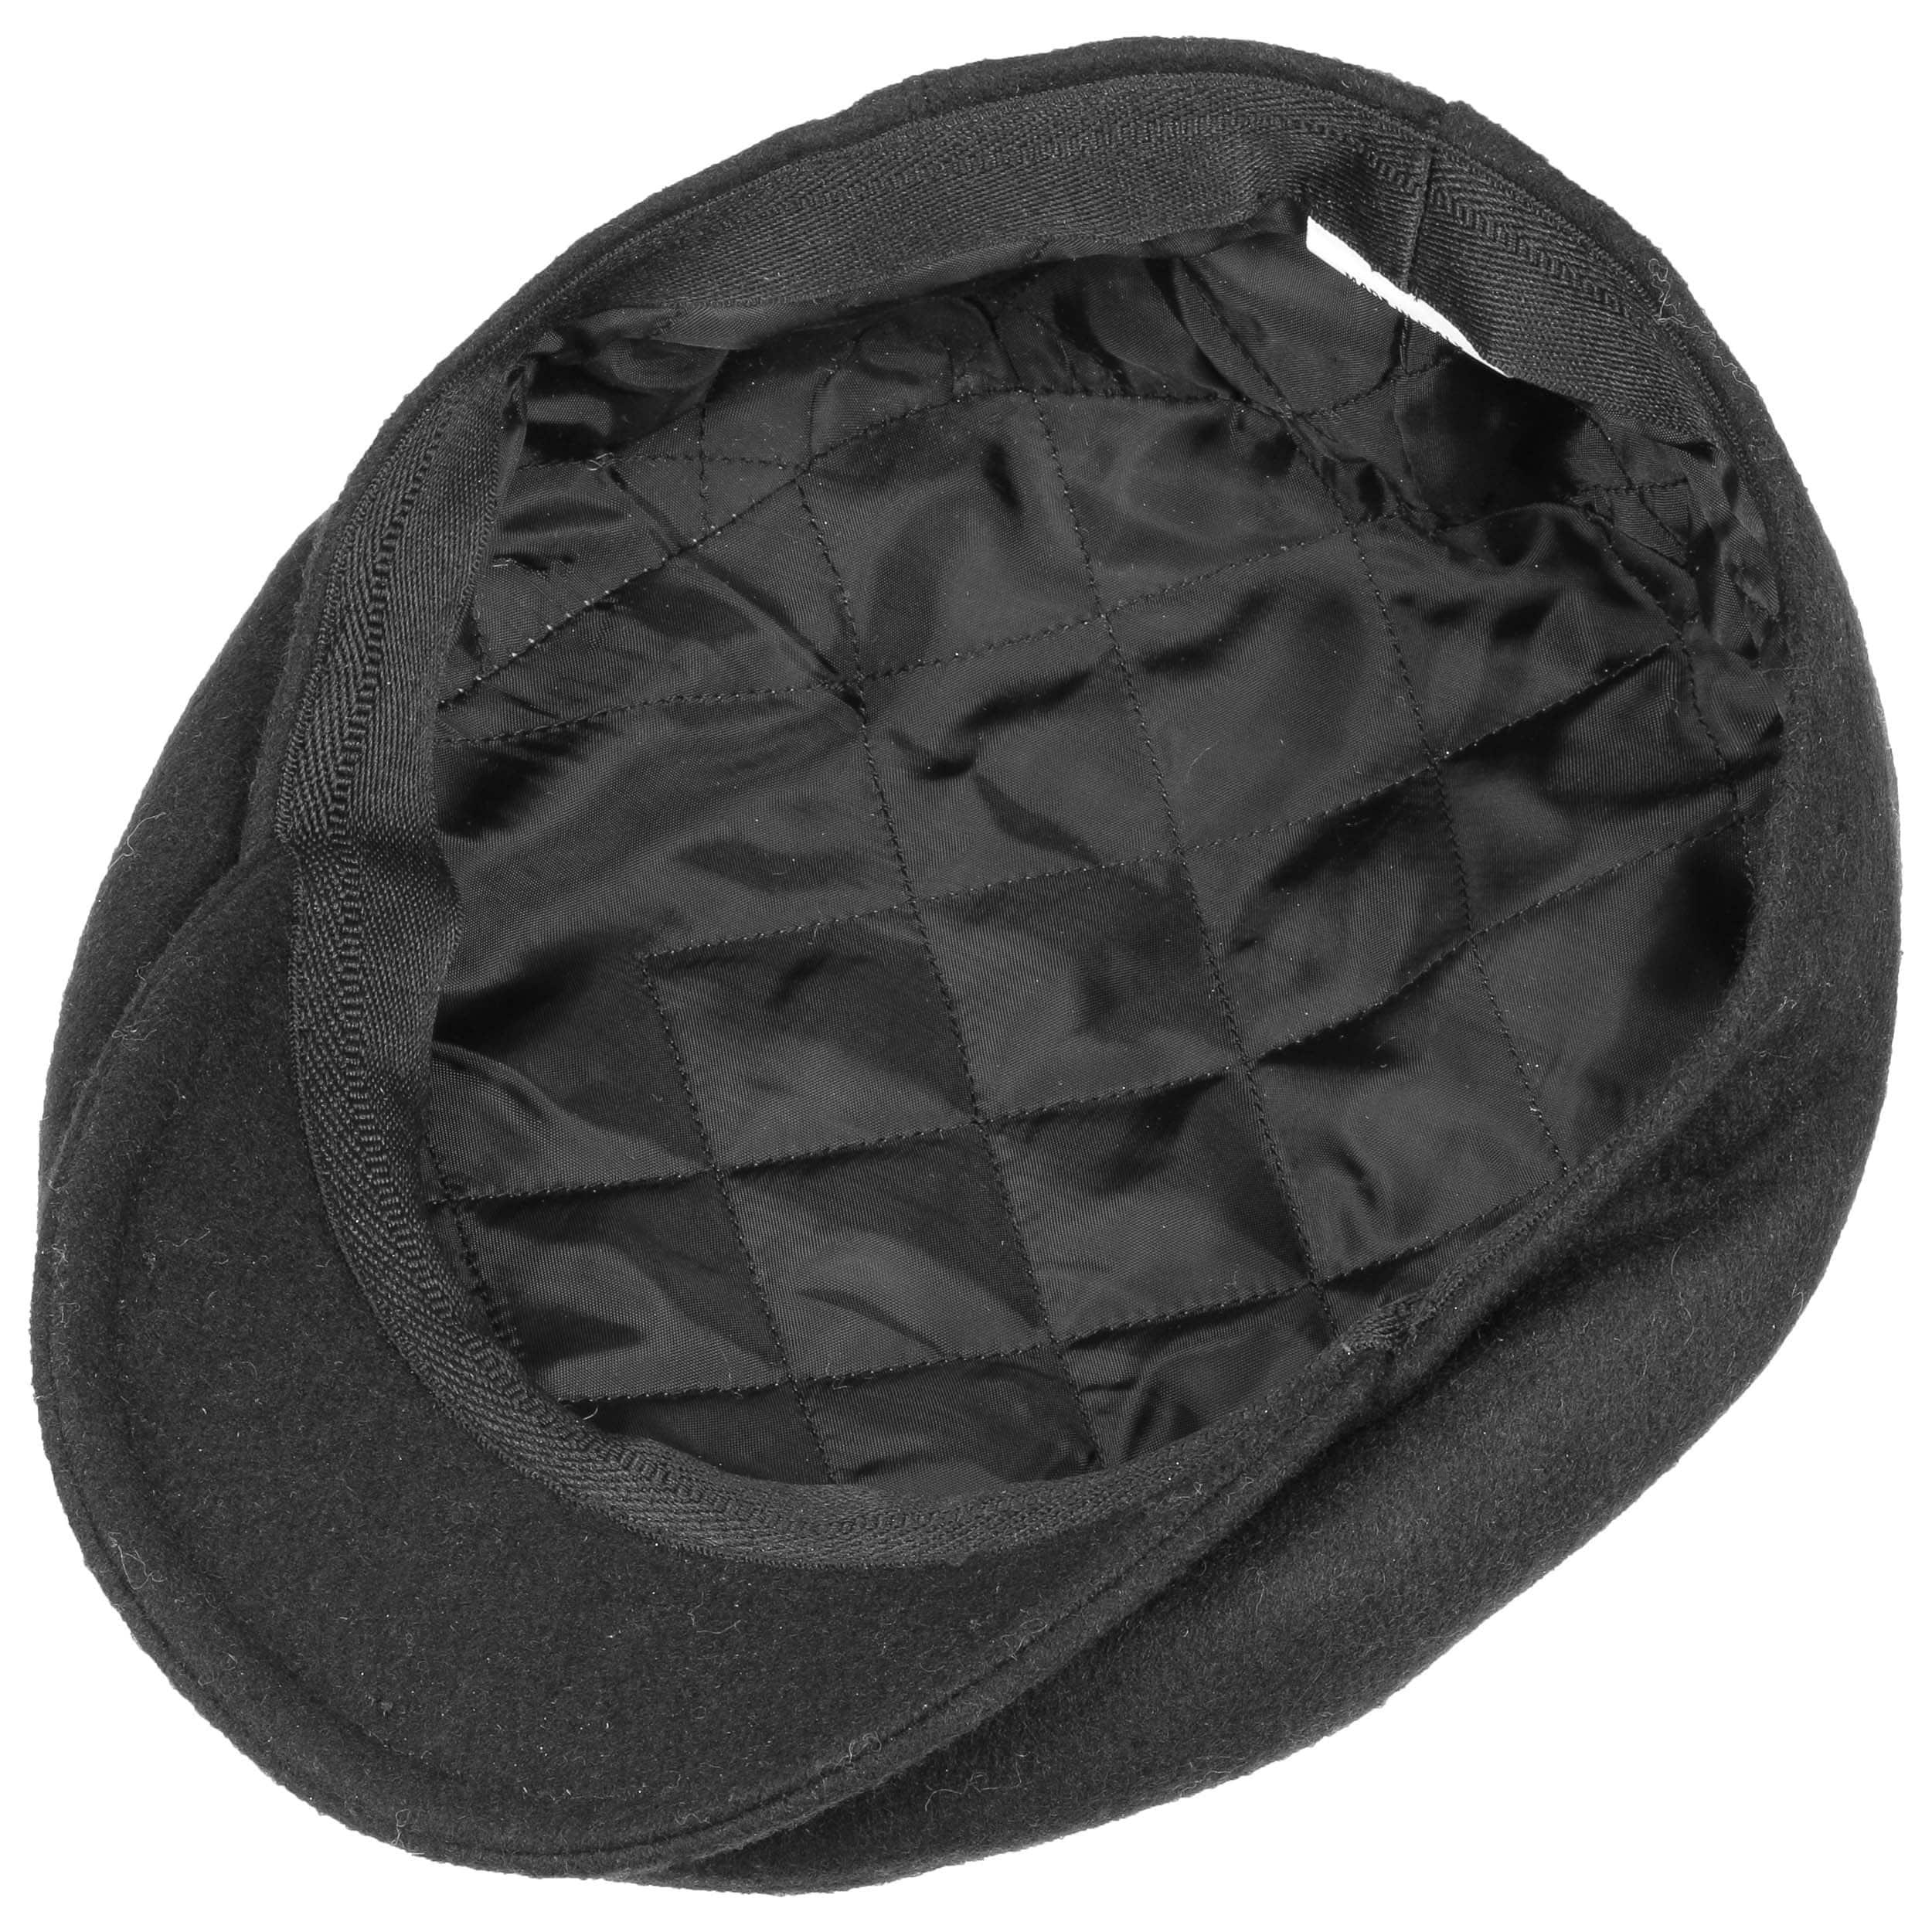 Gorra Gatsby Sport by Lipodo - Gorras - sombreroshop.es a21bdfe3842